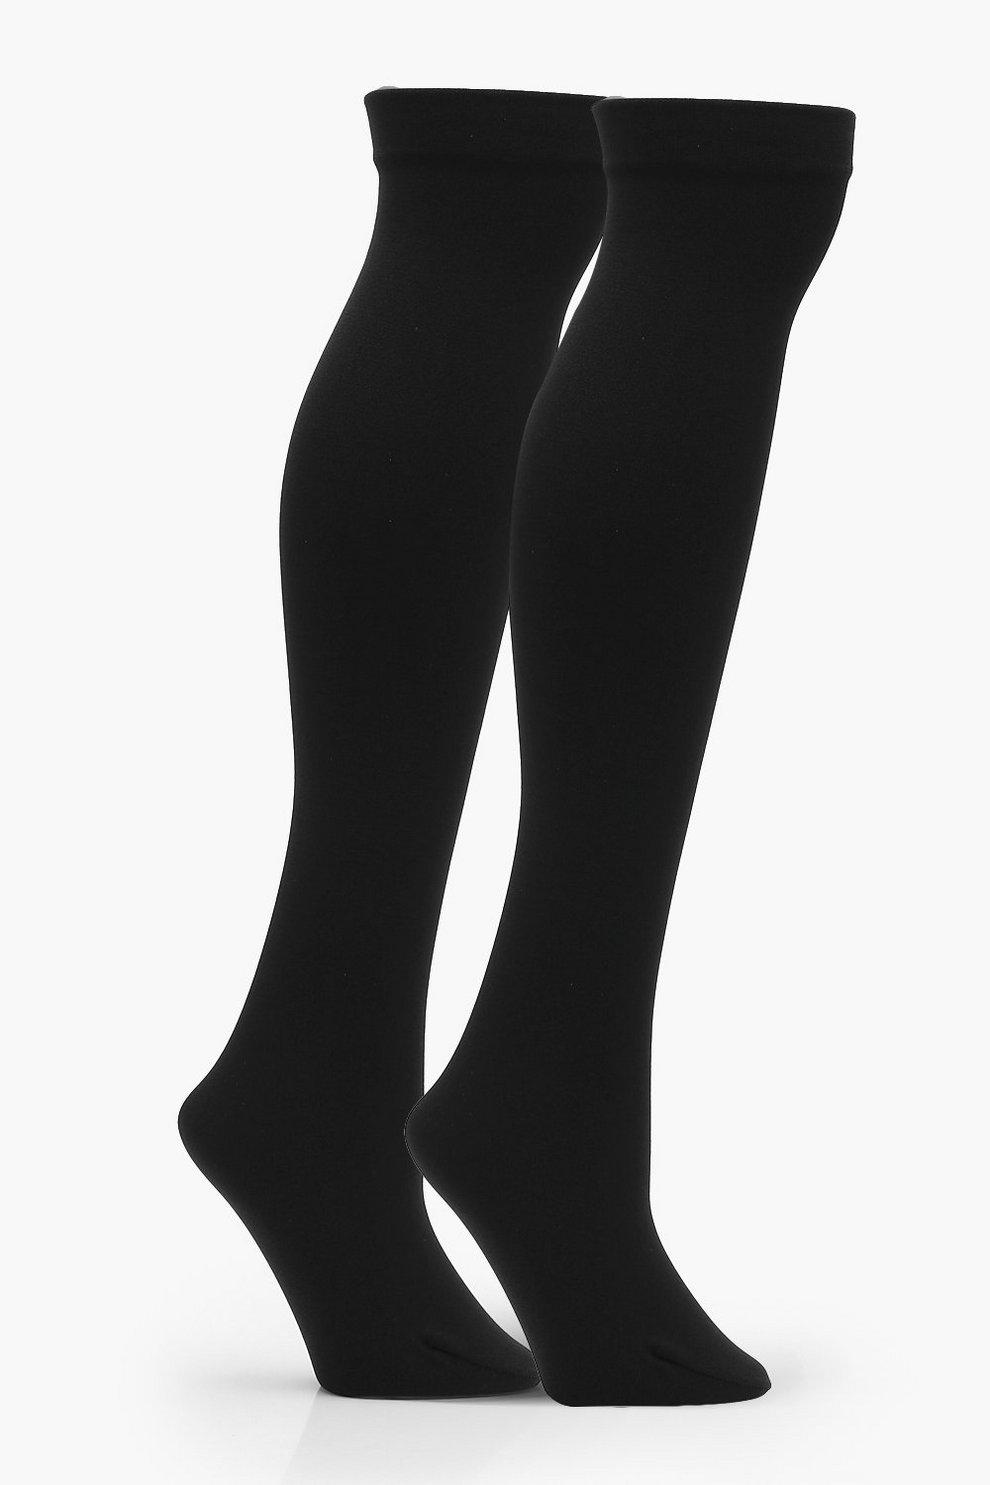 d94b0761deb Mia 2 Pack Thermal Knee High Socks